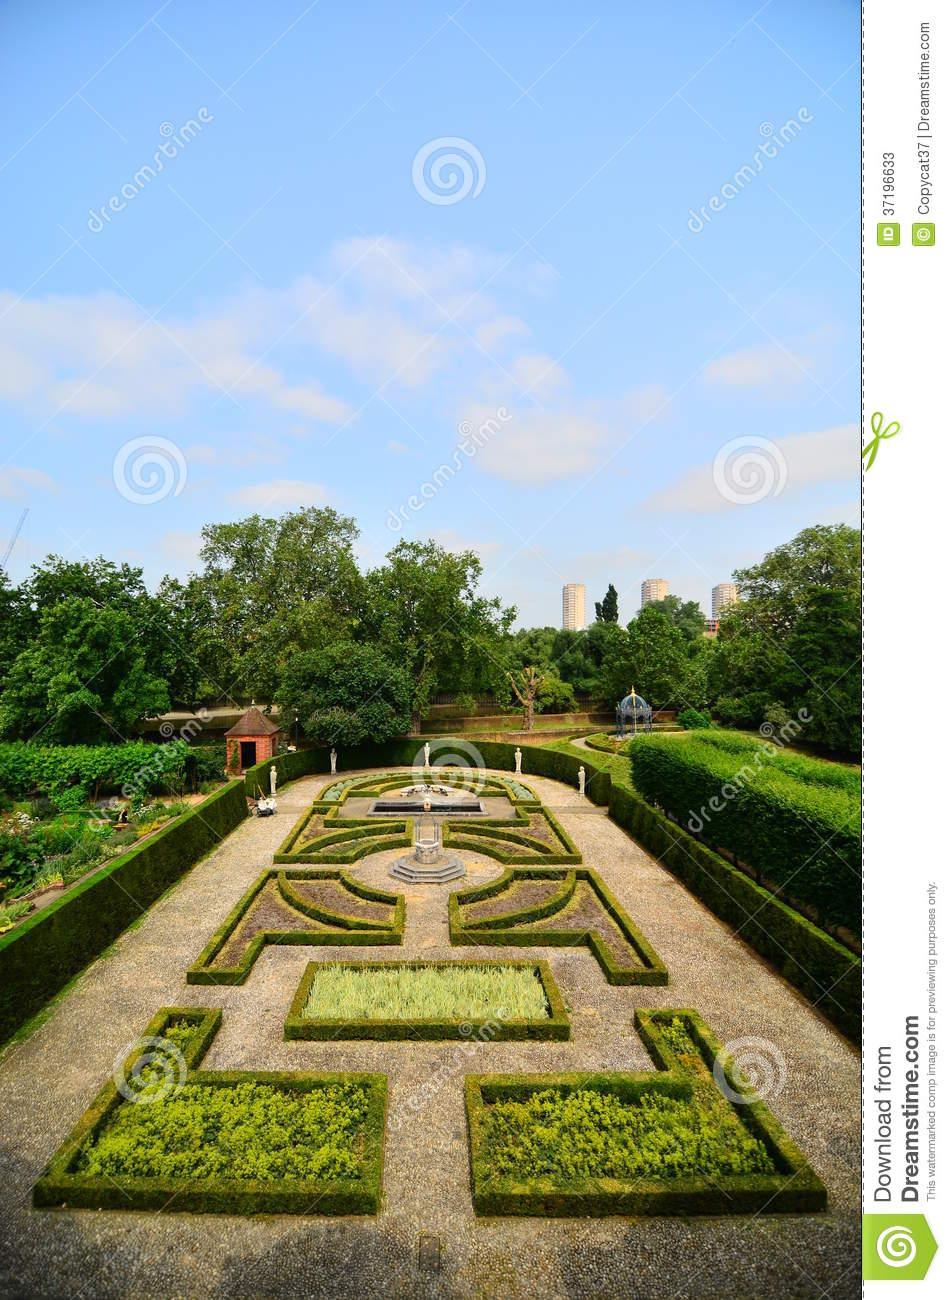 Maze Garden At At Royal Botanic Gardens, Kew Stock Photos.